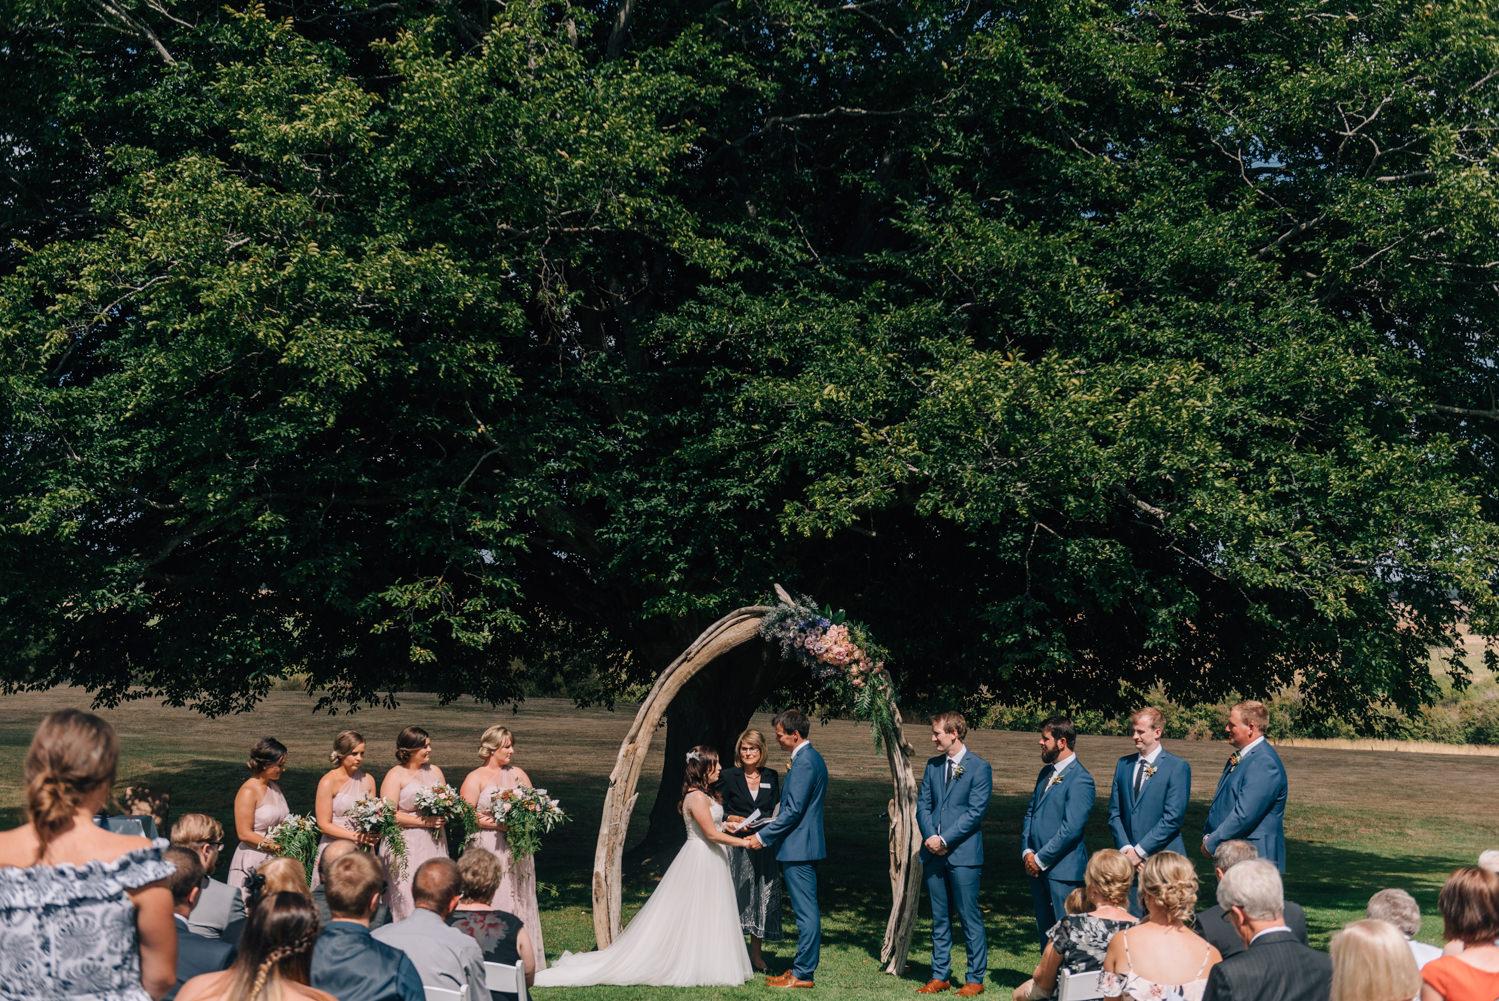 Quamby-Wedding-Photographer-81.jpg